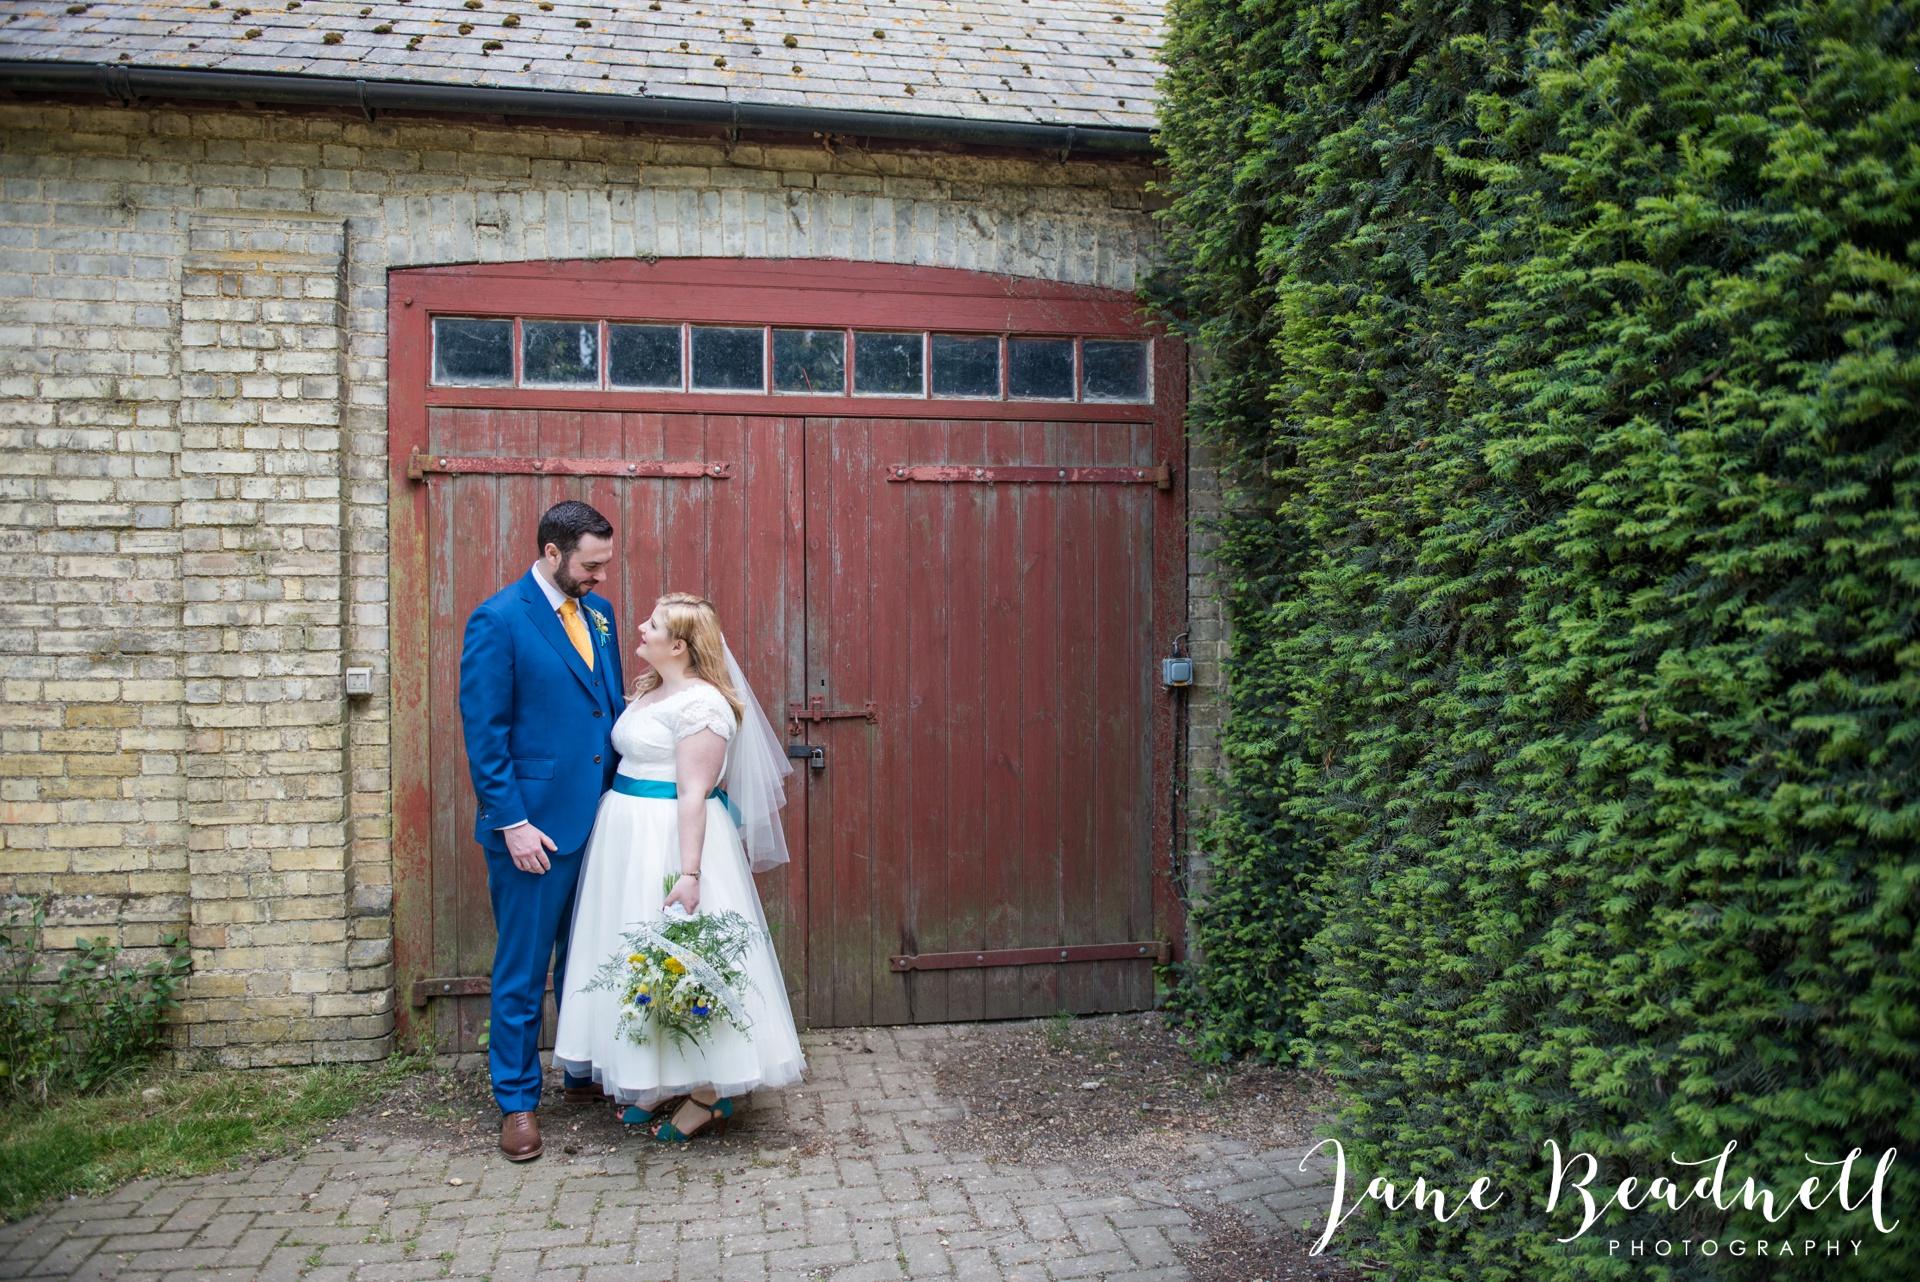 South Farm Wedding photography Hertfordshire by Jane Beadnell Photography fine art wedding photographer_0106